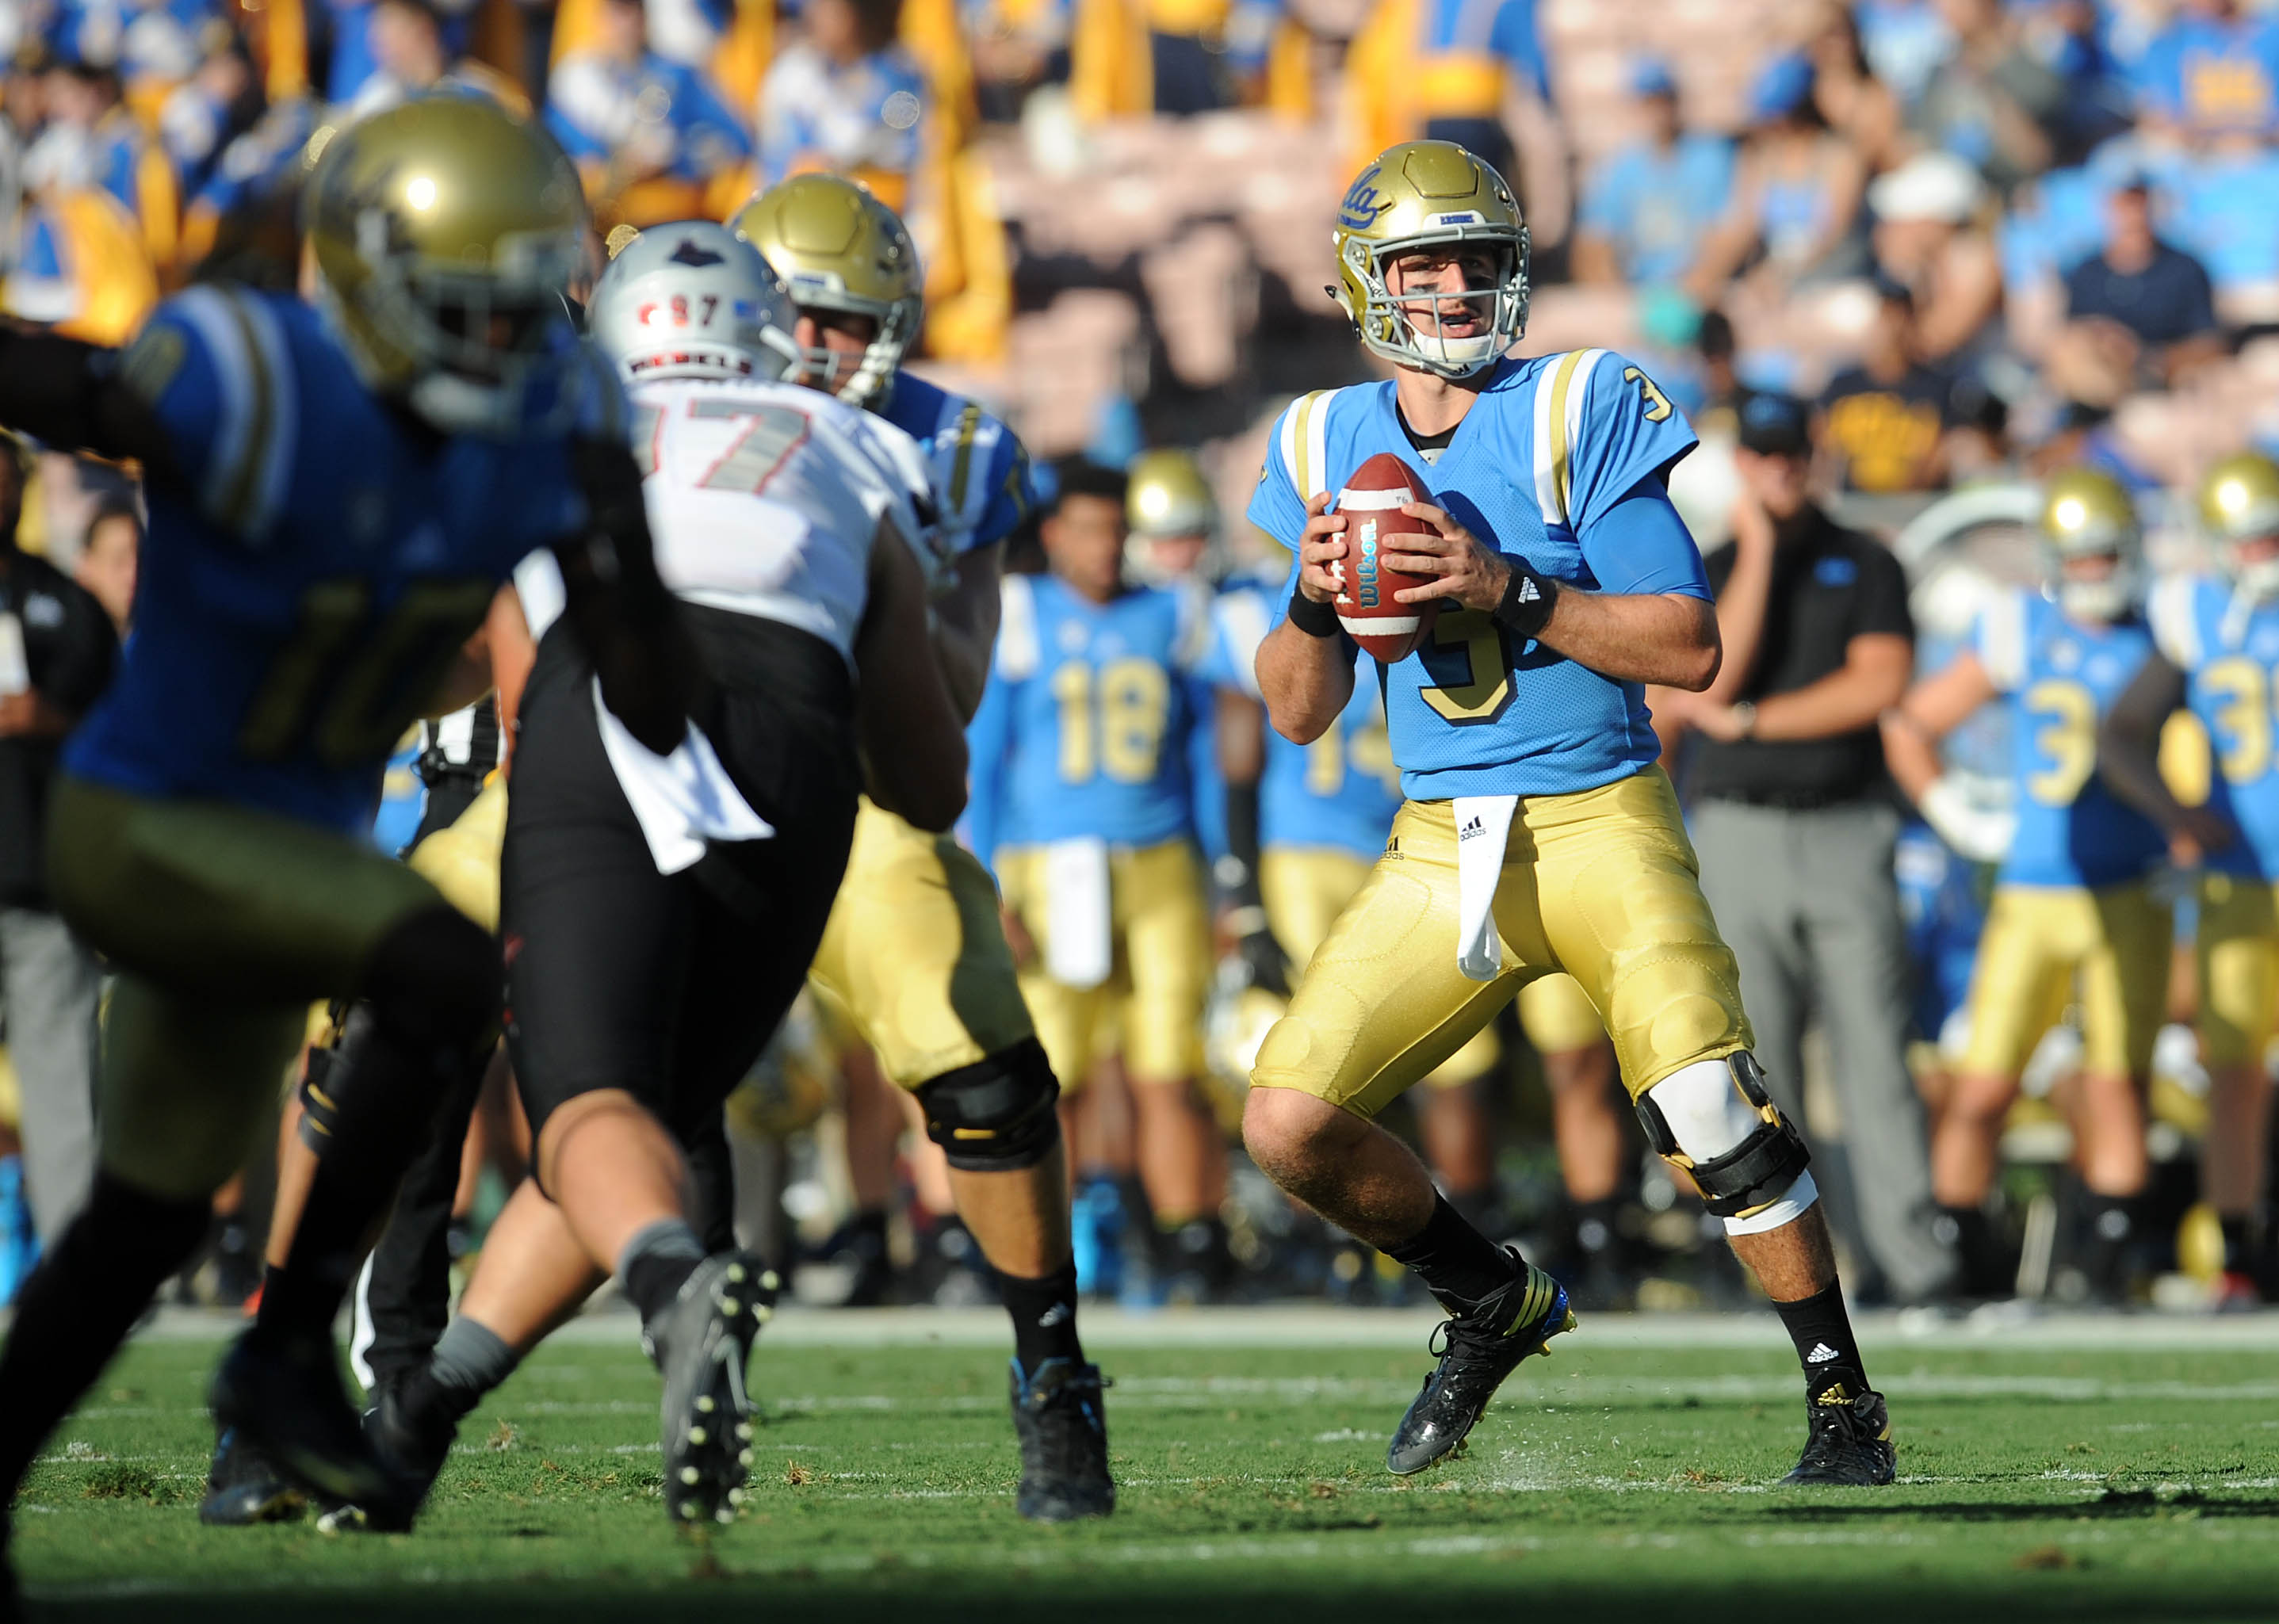 UCLA leads UNLV 28-14 at the half.